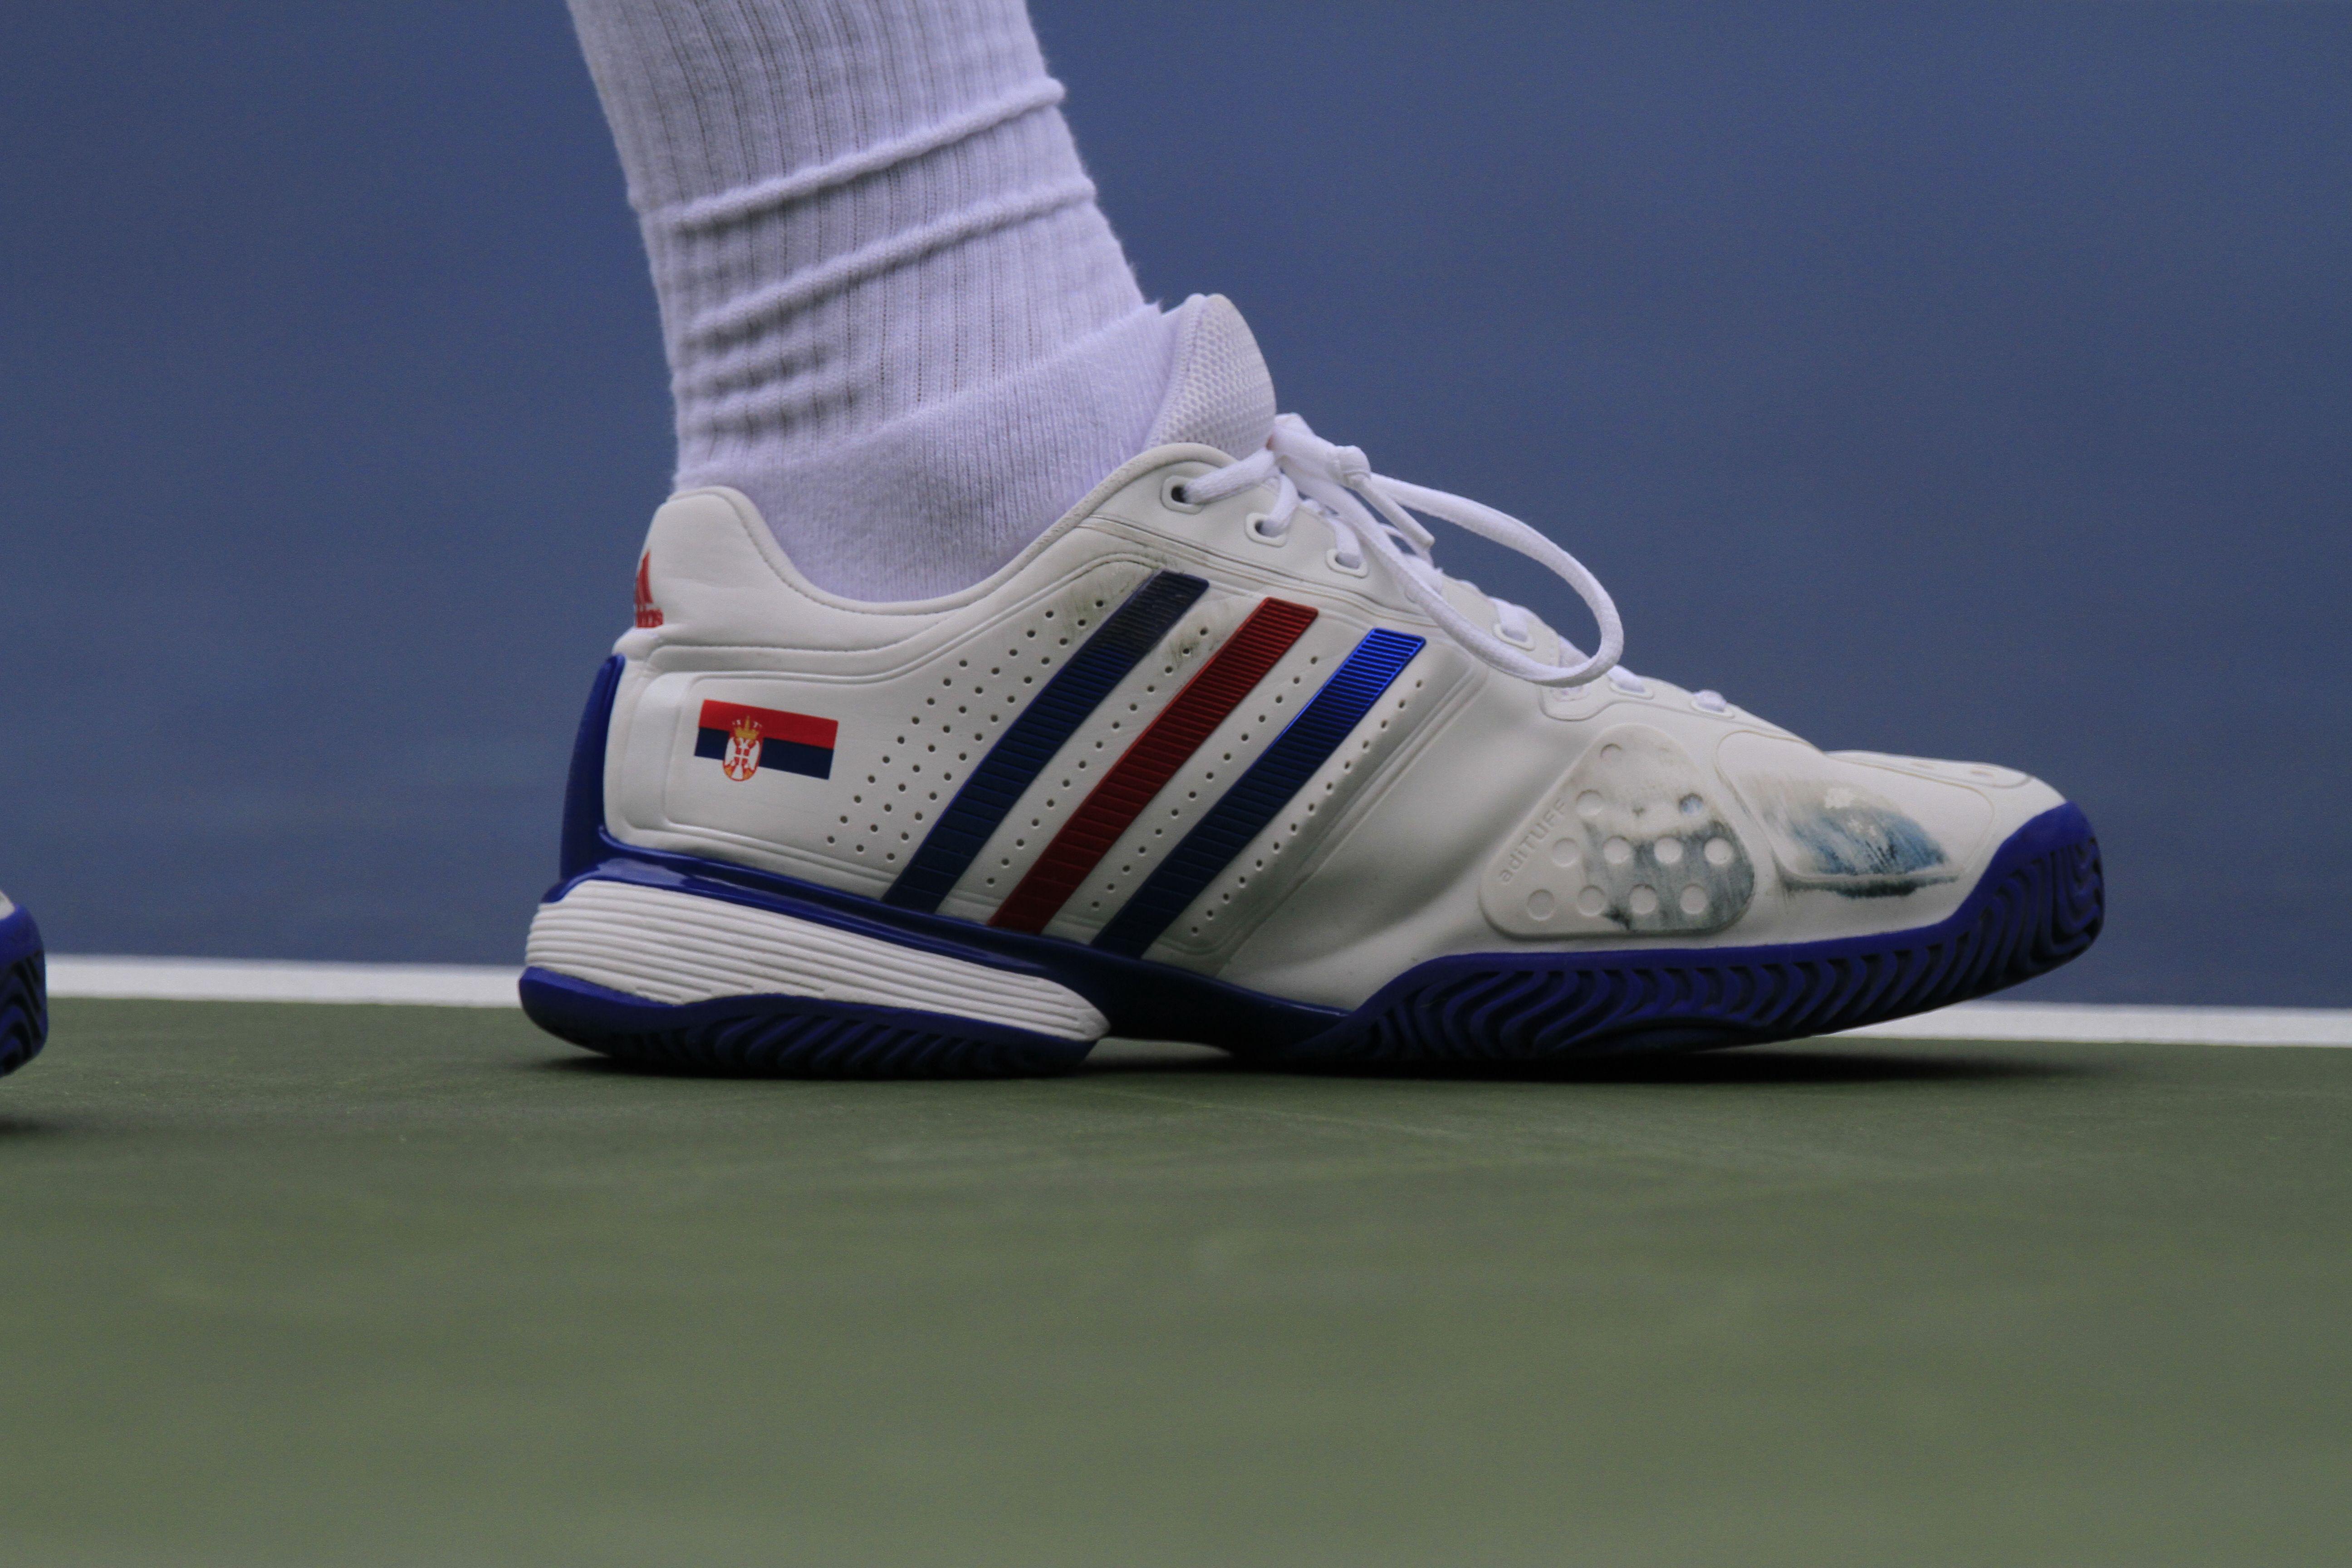 Novak Djokovic sports white shoes with the Serbian flag